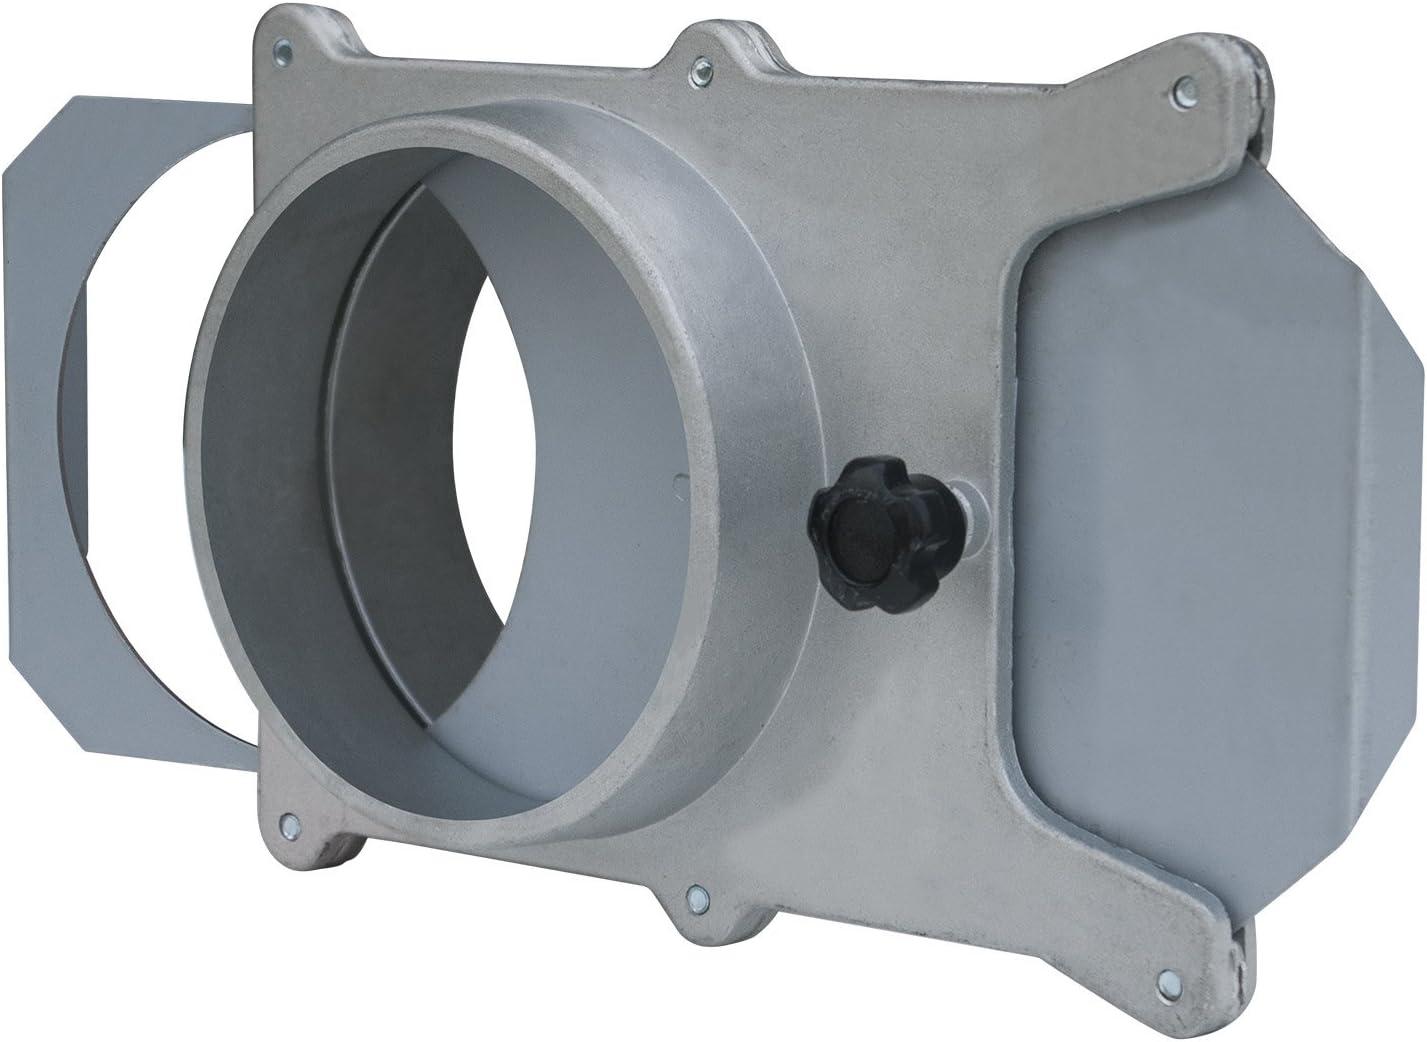 POWERTEC 70135 4-Inch Aluminum Blast Gate for Dust Collector/Vacuum Fittings